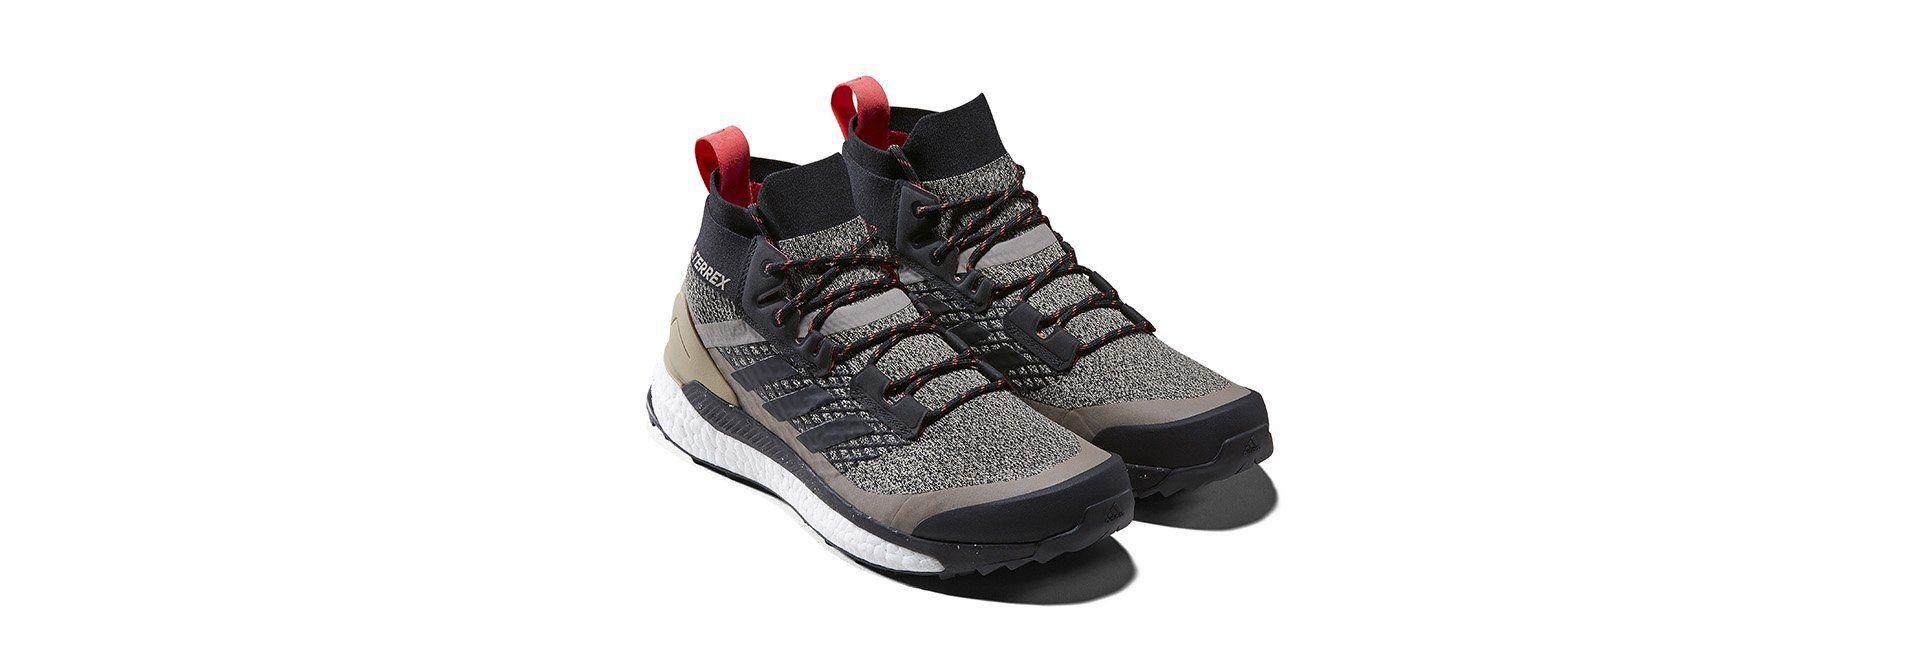 ce443911d Adidas Consortium Terrex Free Hiker – Hanon